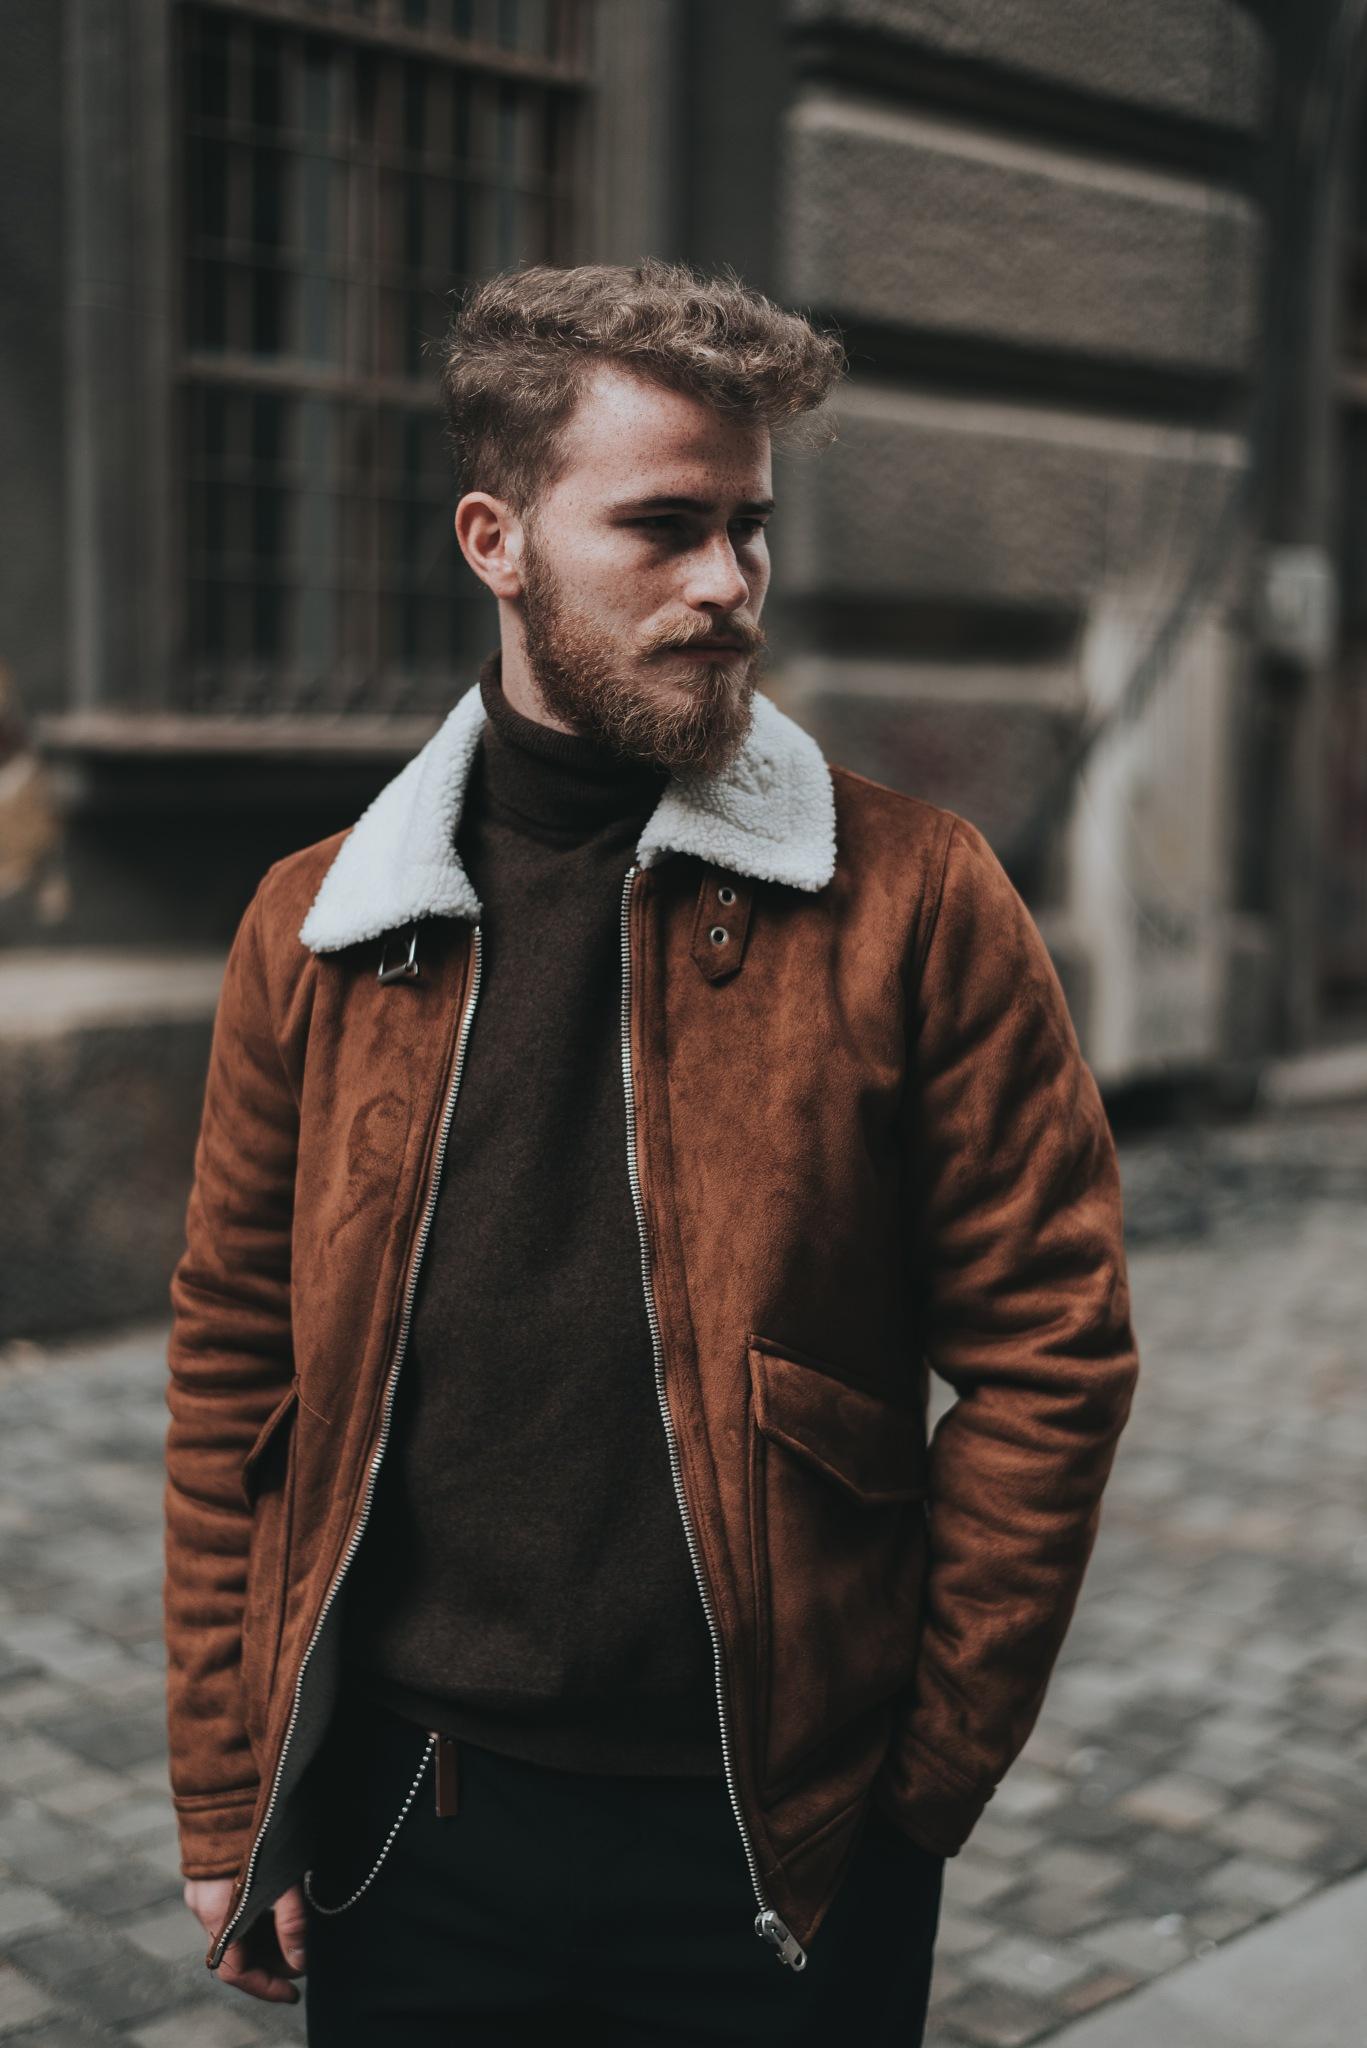 Man wearing a brown jacket by Skh Jr